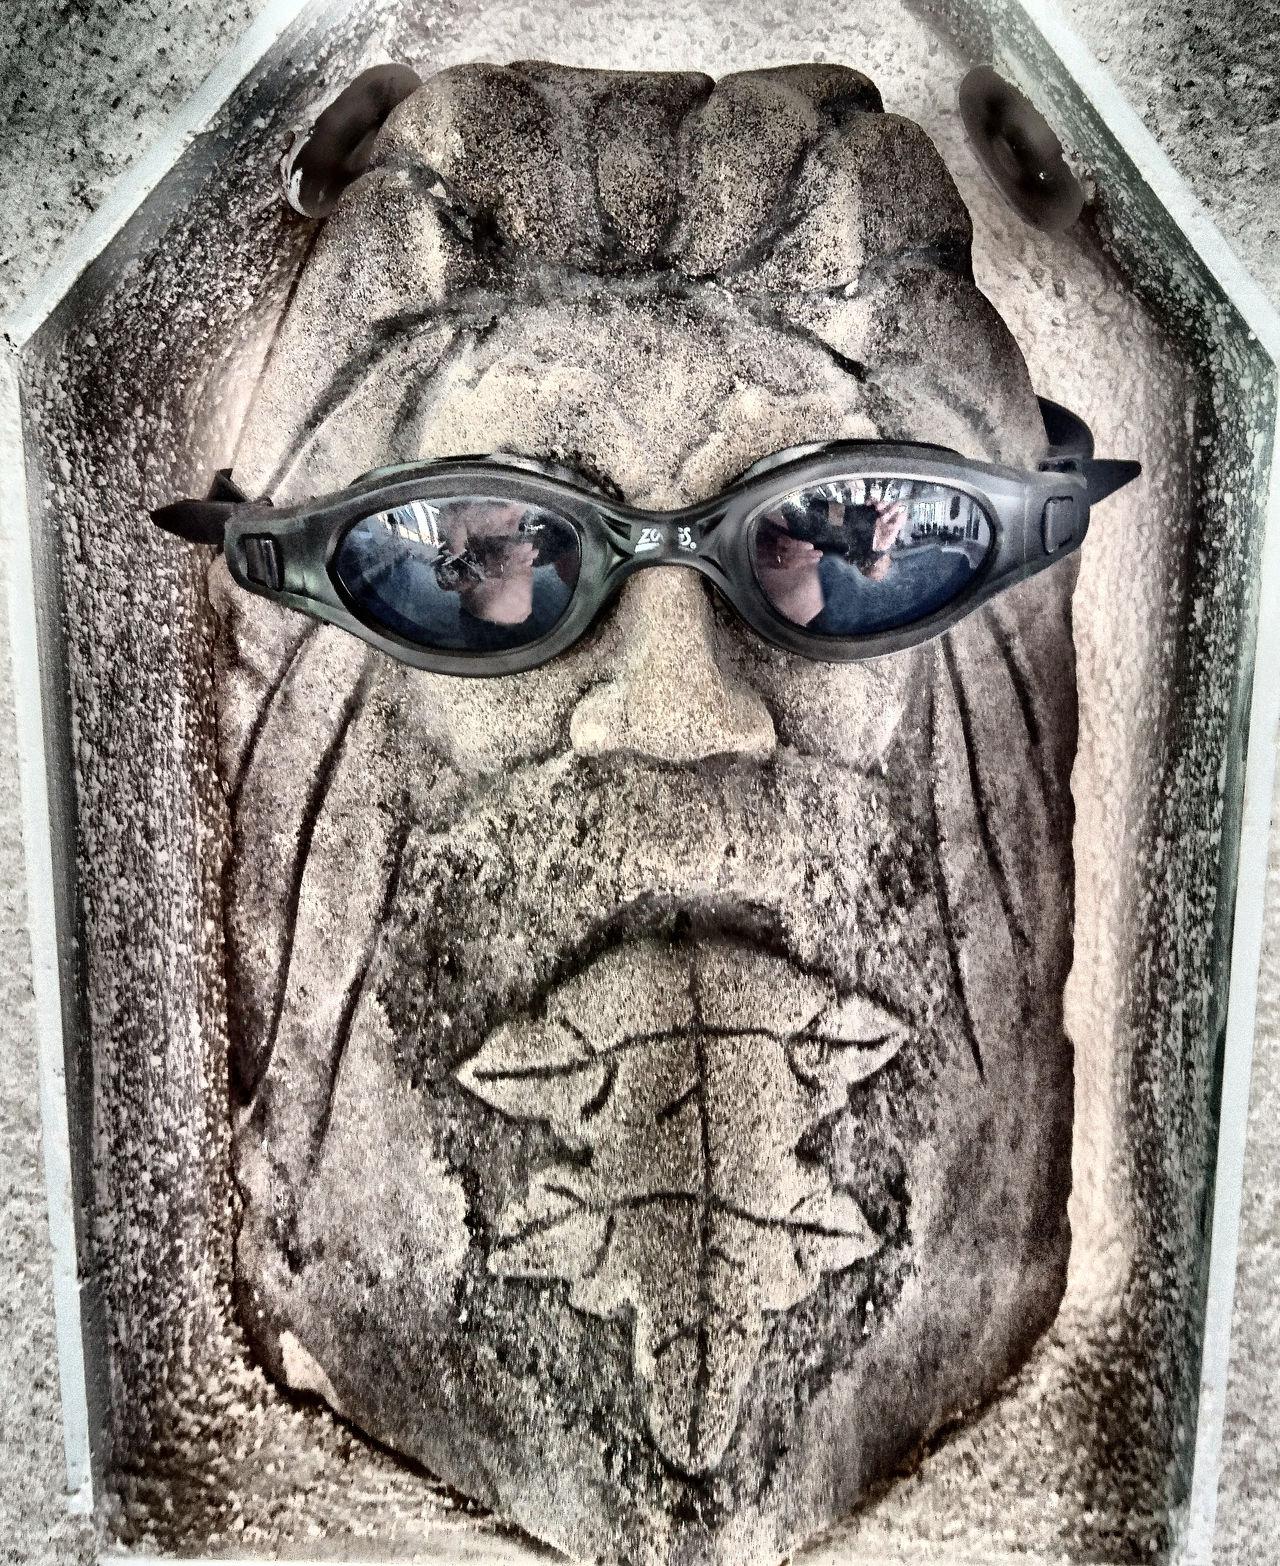 Deity Green Man Greenman Statue Stone Carving Surreal